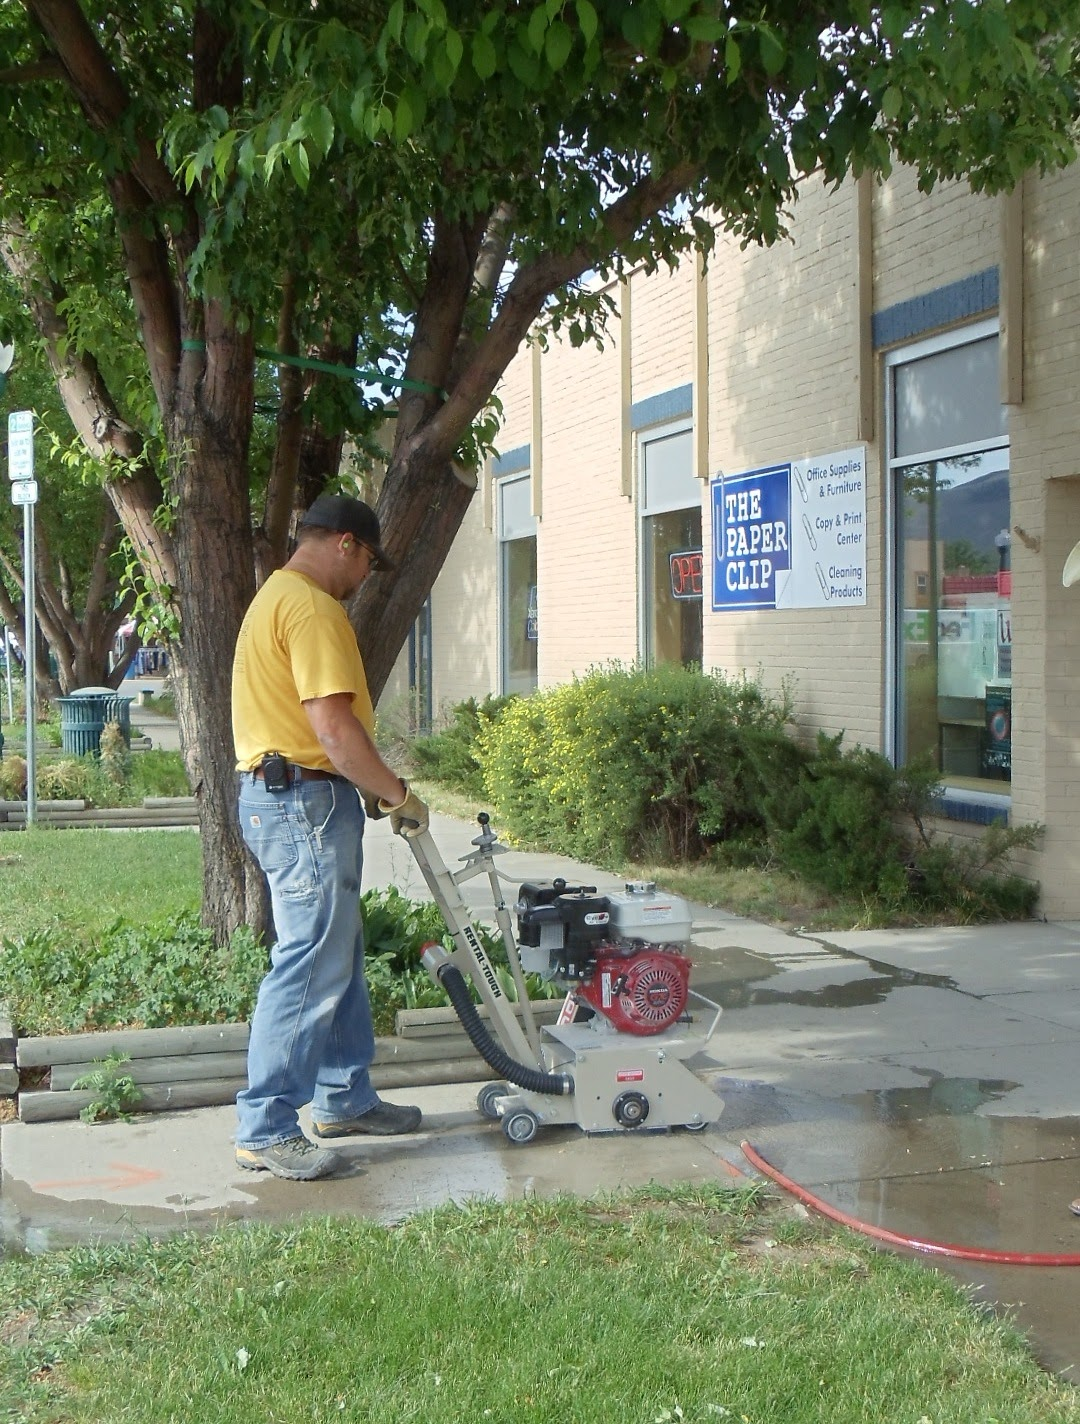 Concrete Sidewalk Grinding : City of gunnison happenings sidewalk improvements